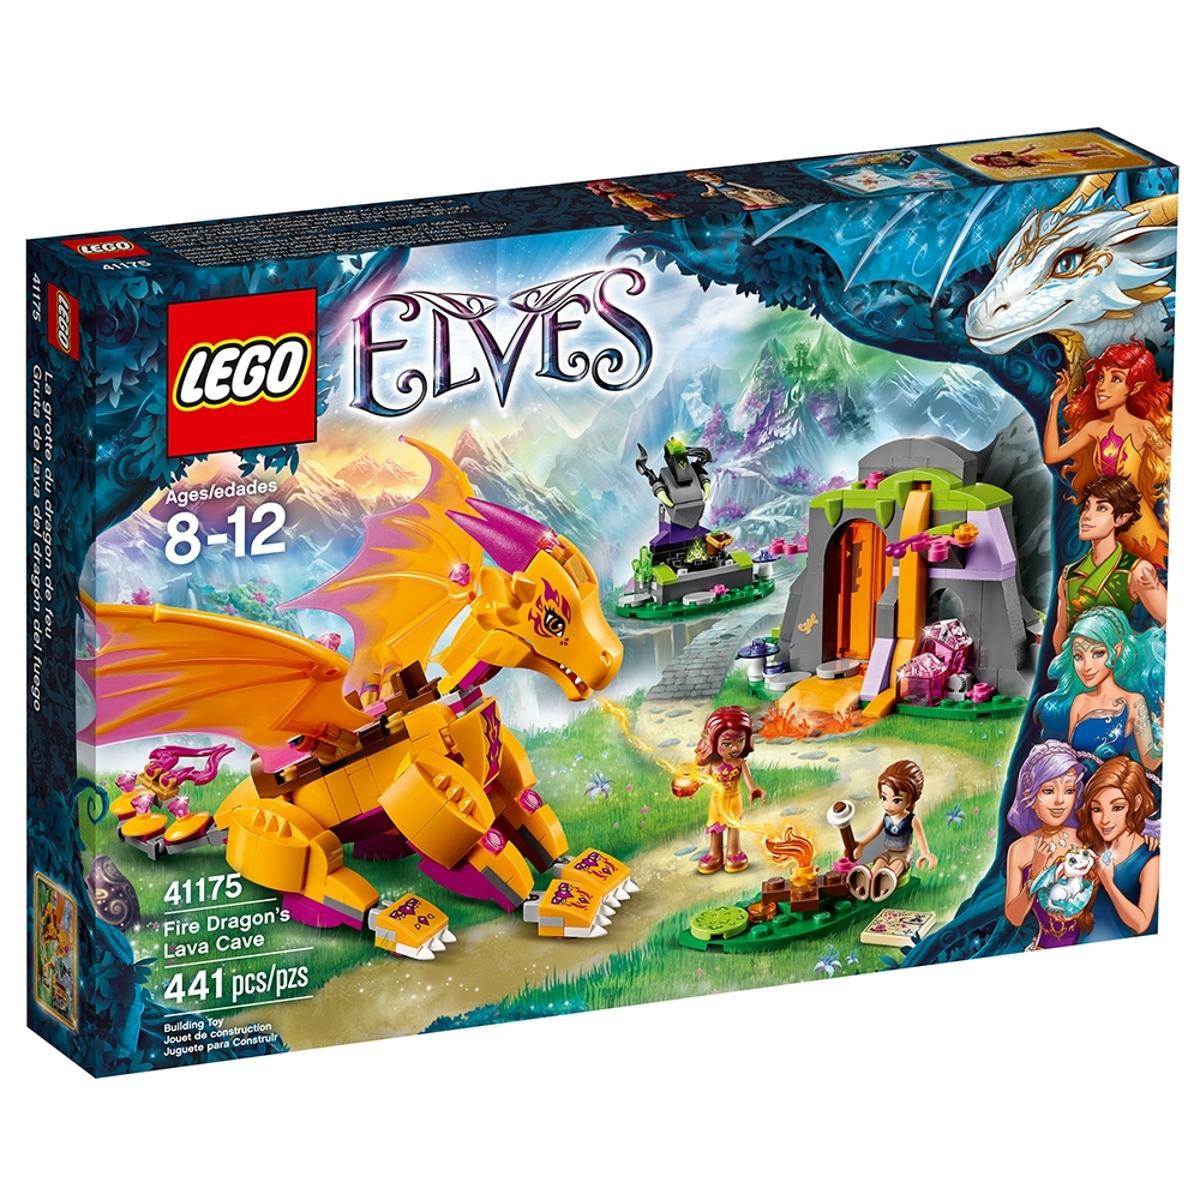 lego 41175 fire dragons lava cave